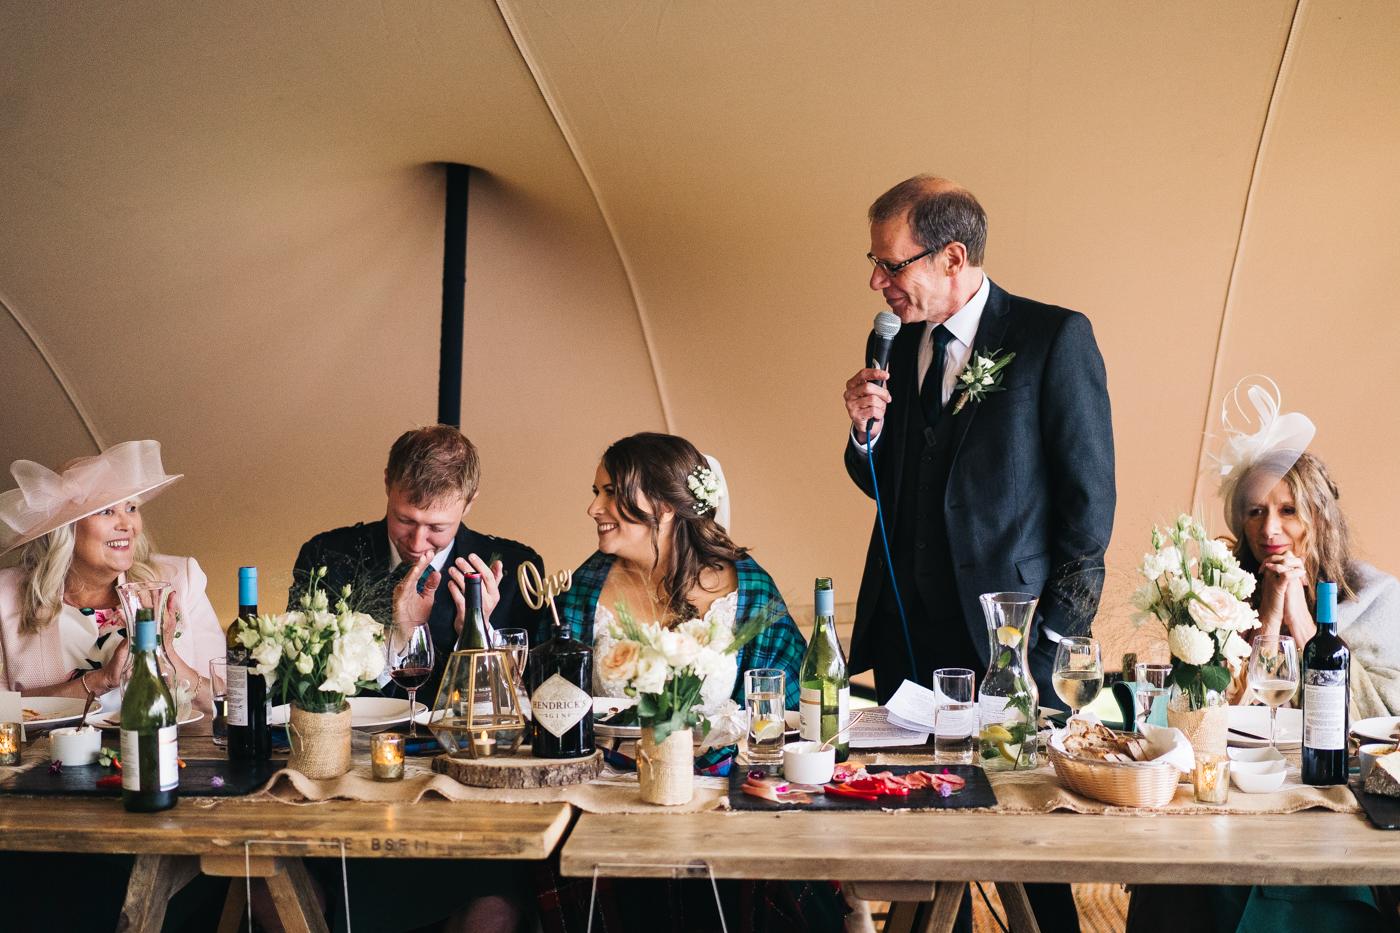 scottish-wedding-trossachs-loch-tay-highlannds-relaxed-photography-photographer-0042.jpg